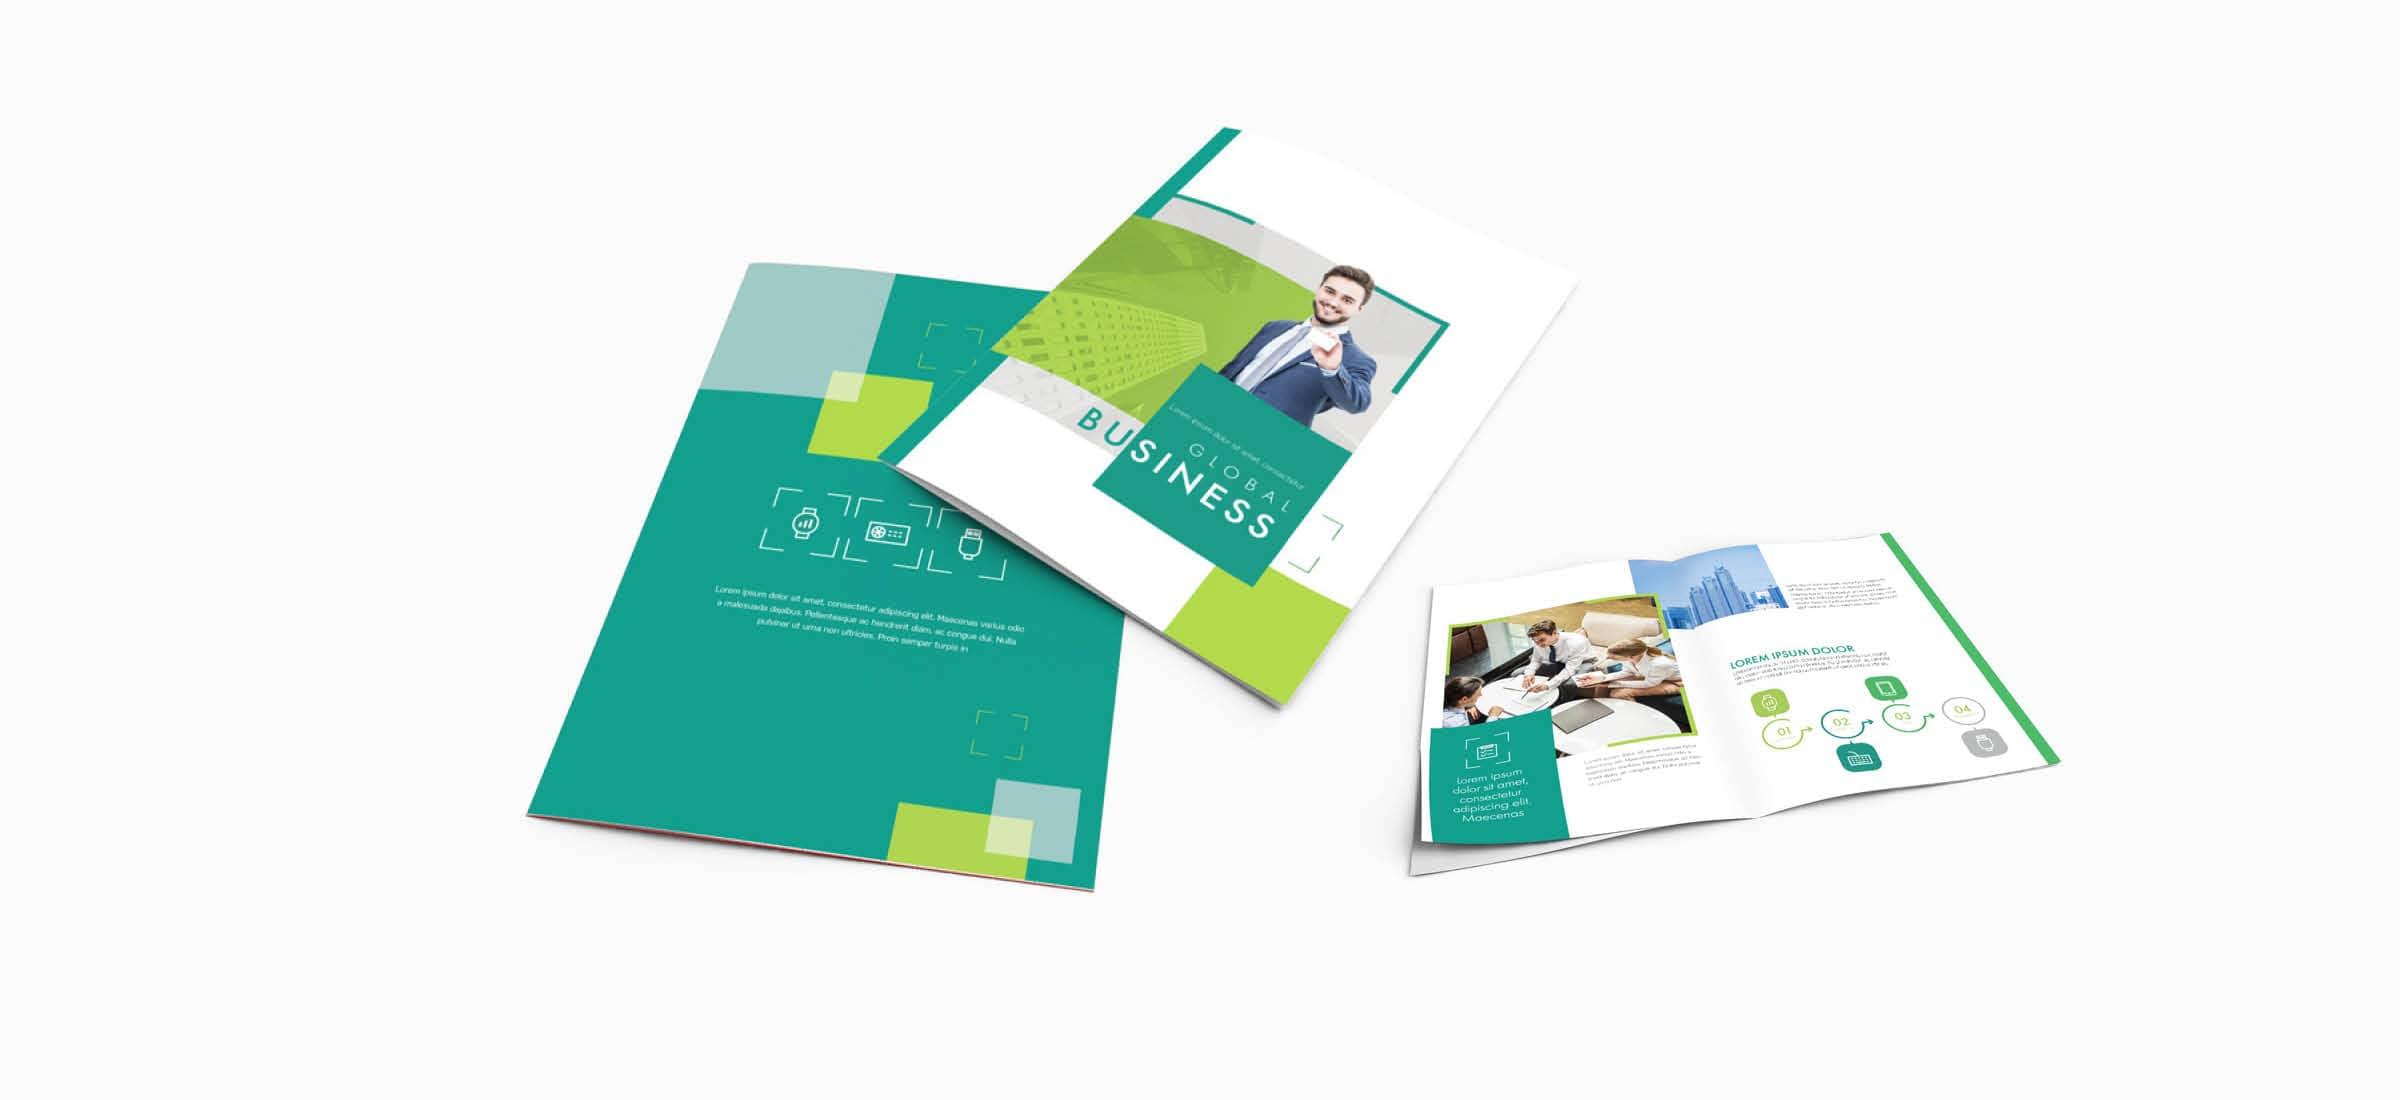 catalog printing cheap, saddle stitch printing, custom booklet printing no minimum, stapled booklet printing, saddlestitch booklet, custom booklet printing